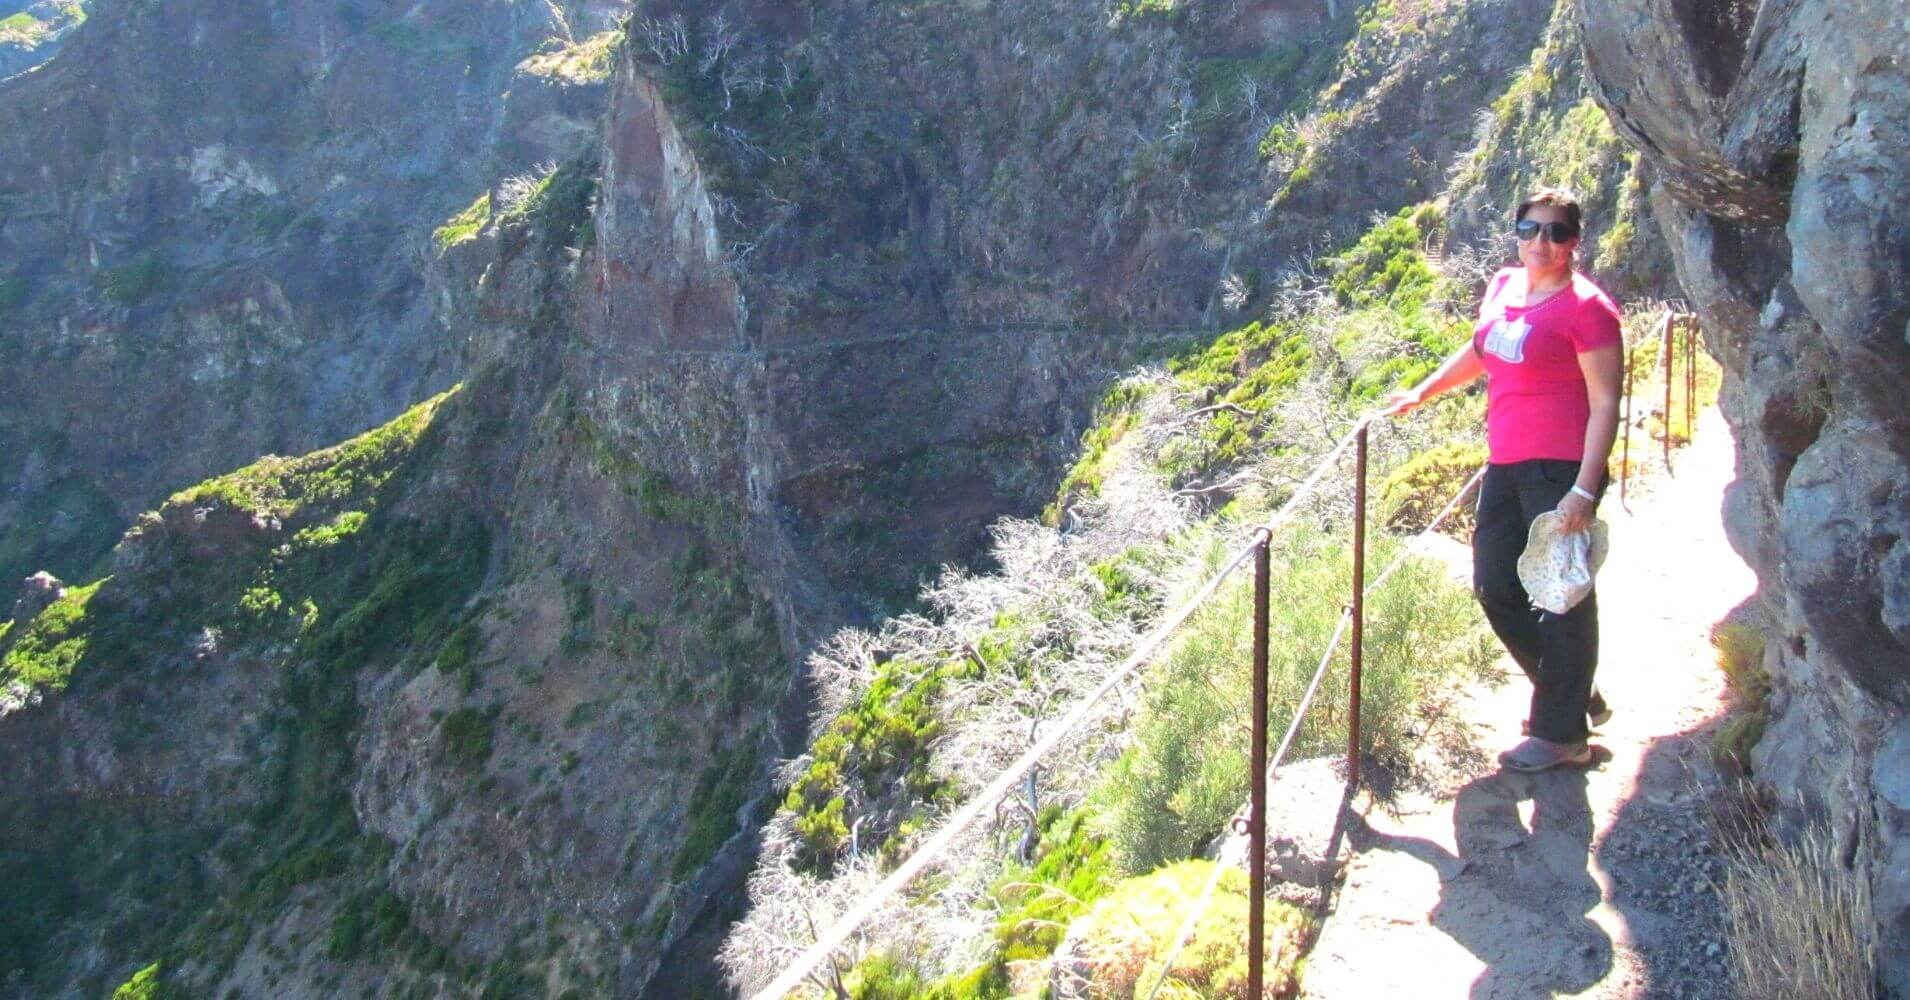 Vereda do Areeiro en la Isla de Madeira. Portugal.